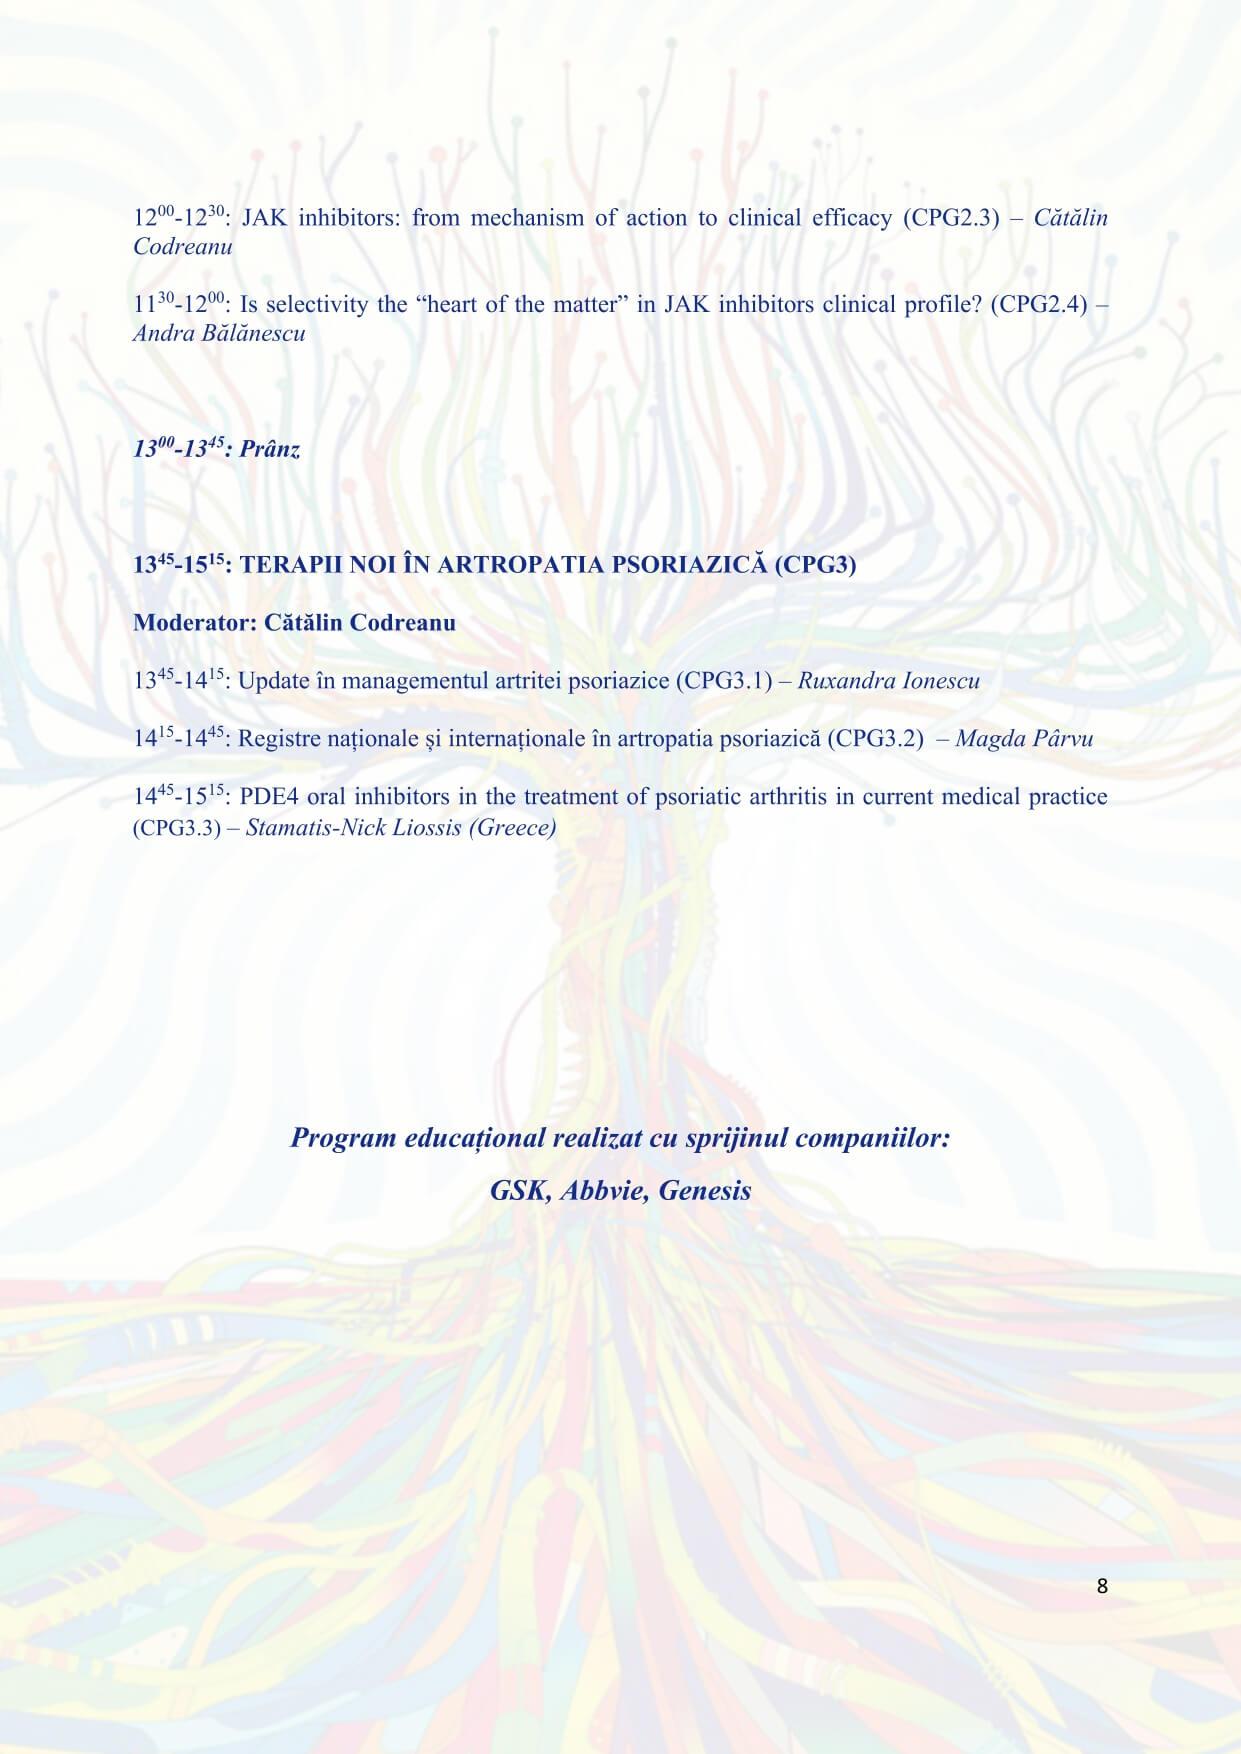 Program_CNR_2019_final__23,09,19_________________page-0008